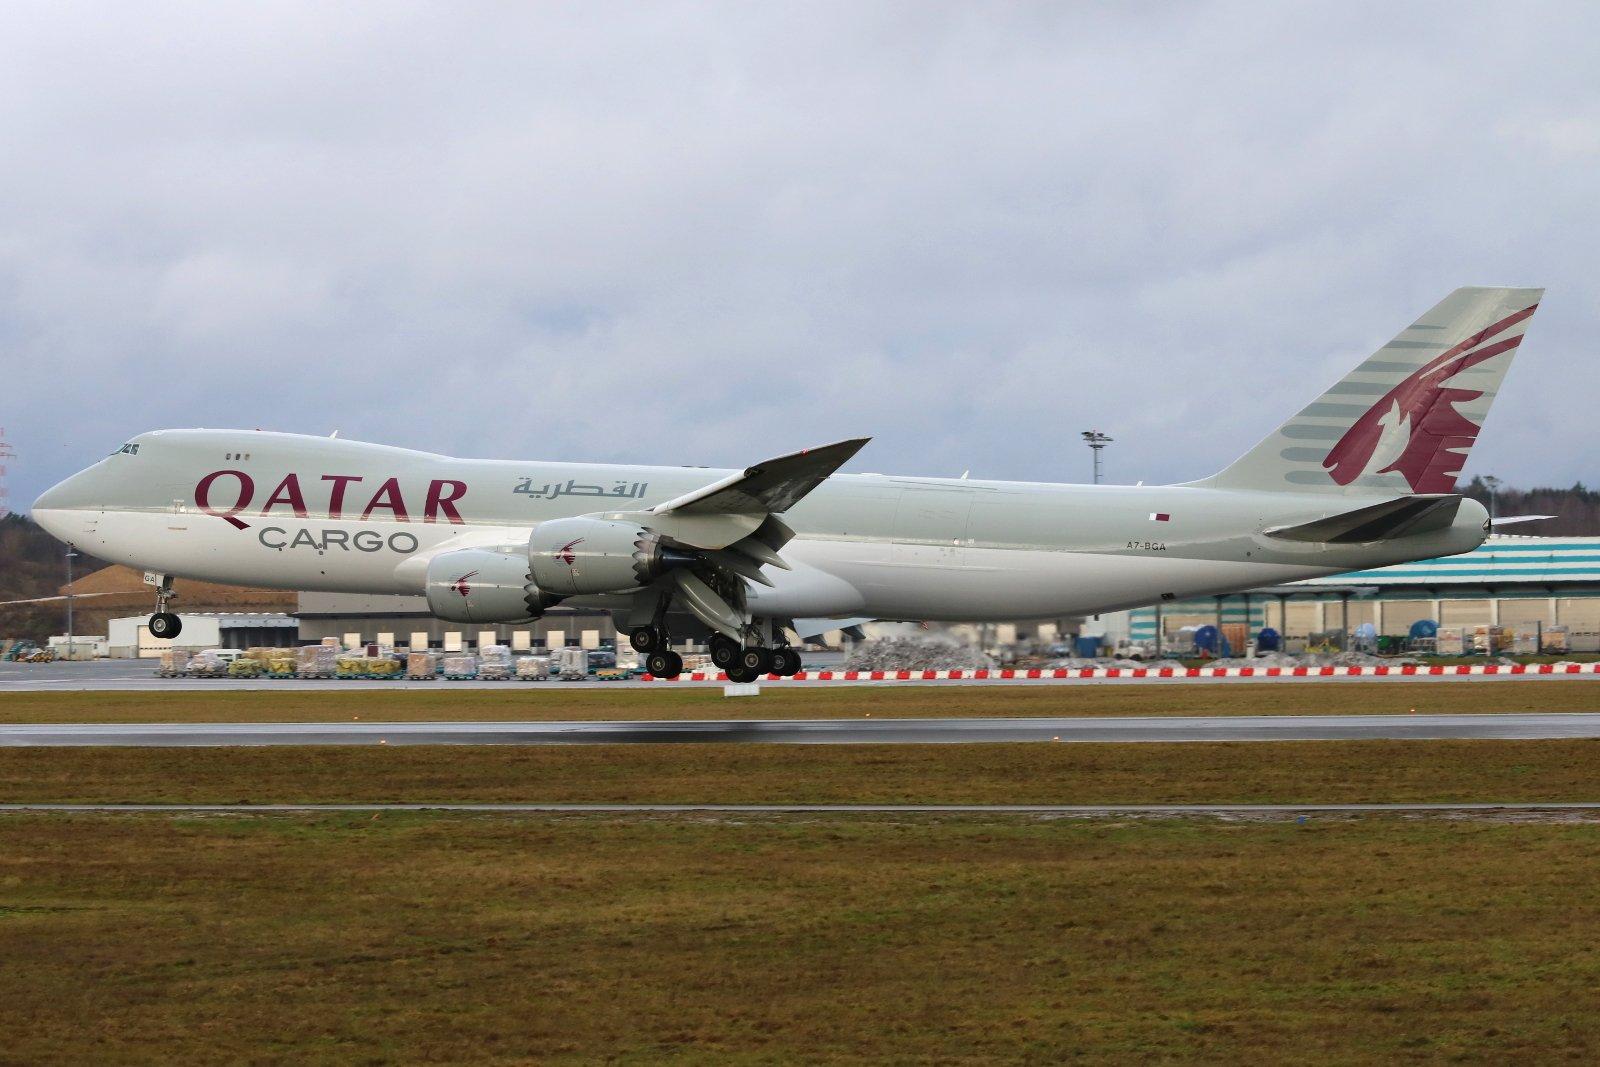 Heavy stuff from @qatarairways @luxairport their brand new second #boeing 747-8F A7-BGA. #avgeek #b747 #boeing747 https://t.co/VF0QJUsi1x